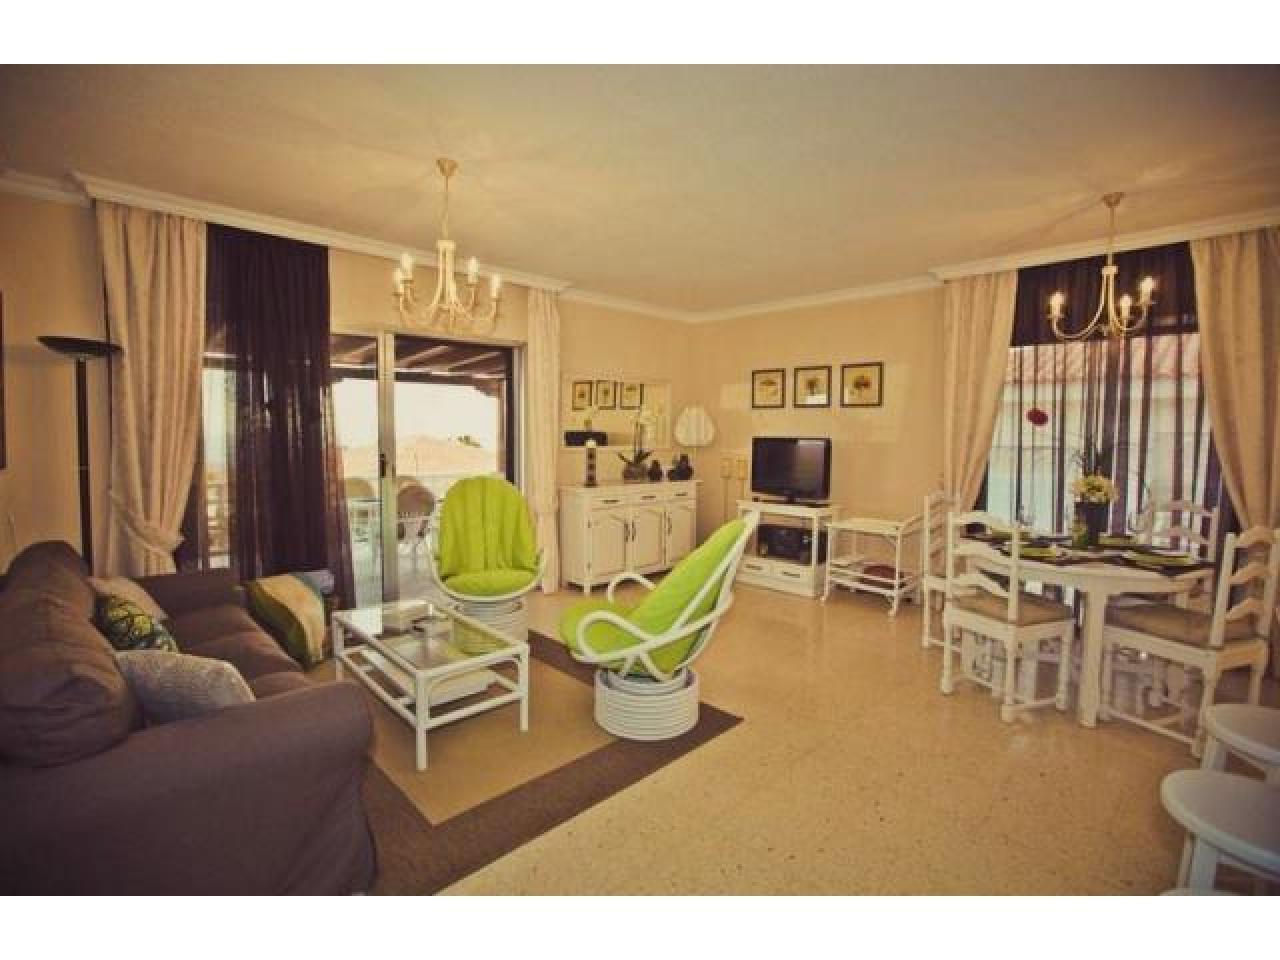 Spacious villa with views of the Atlantic Ocean. - 5